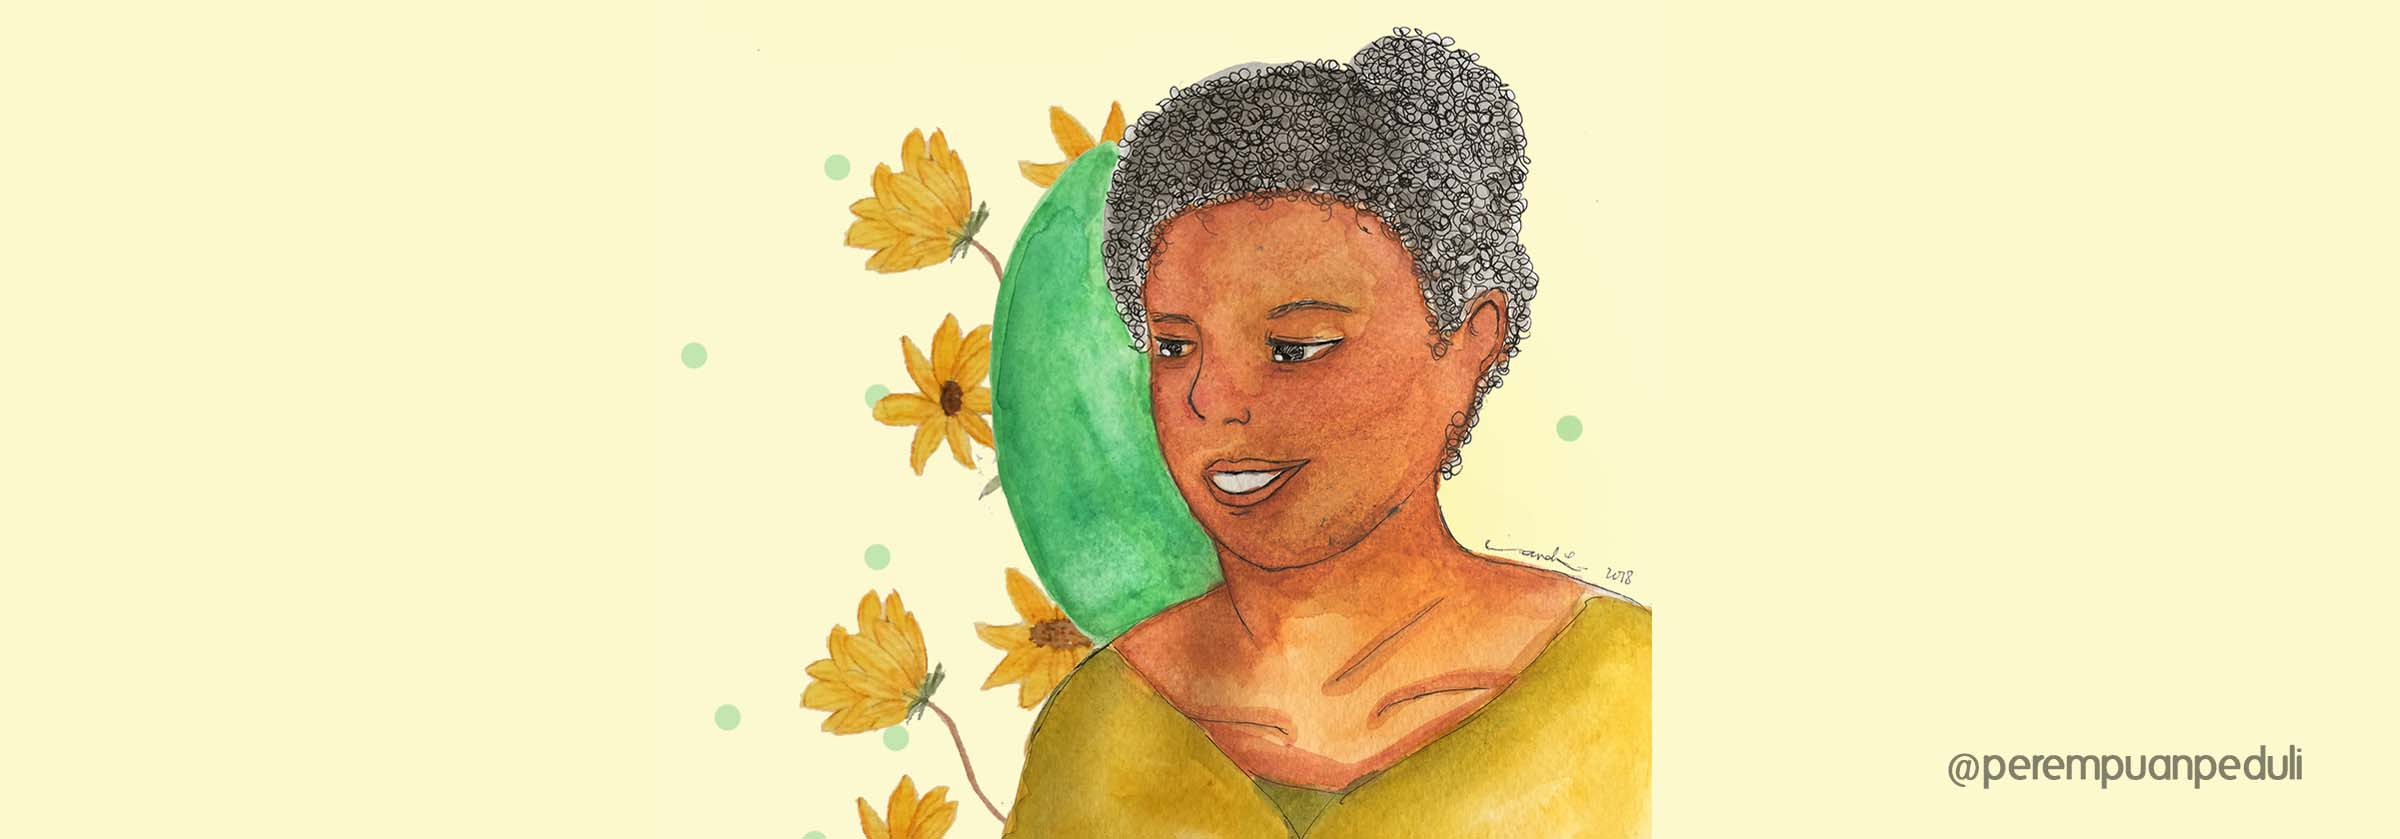 Feminisme Multikultural: Opresi Perempuan Tidak Selalu Sama